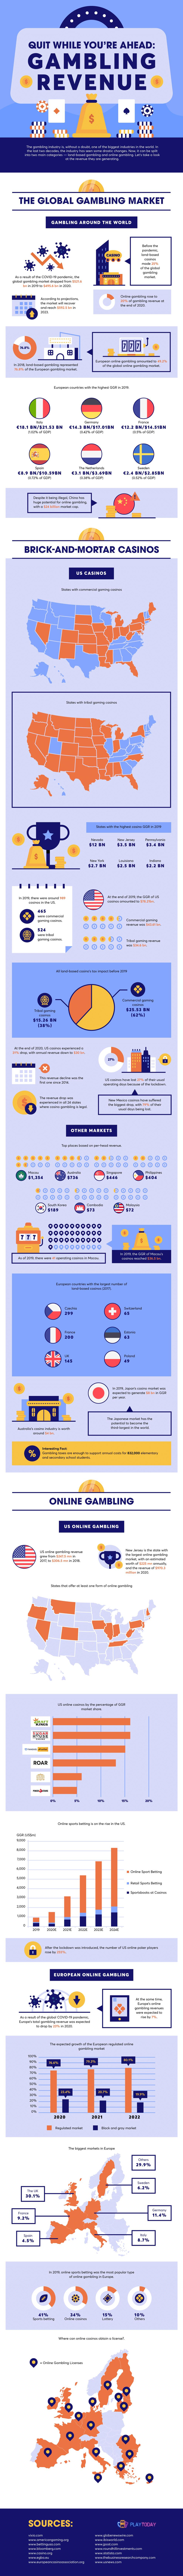 Gambling Revenues - Infographic